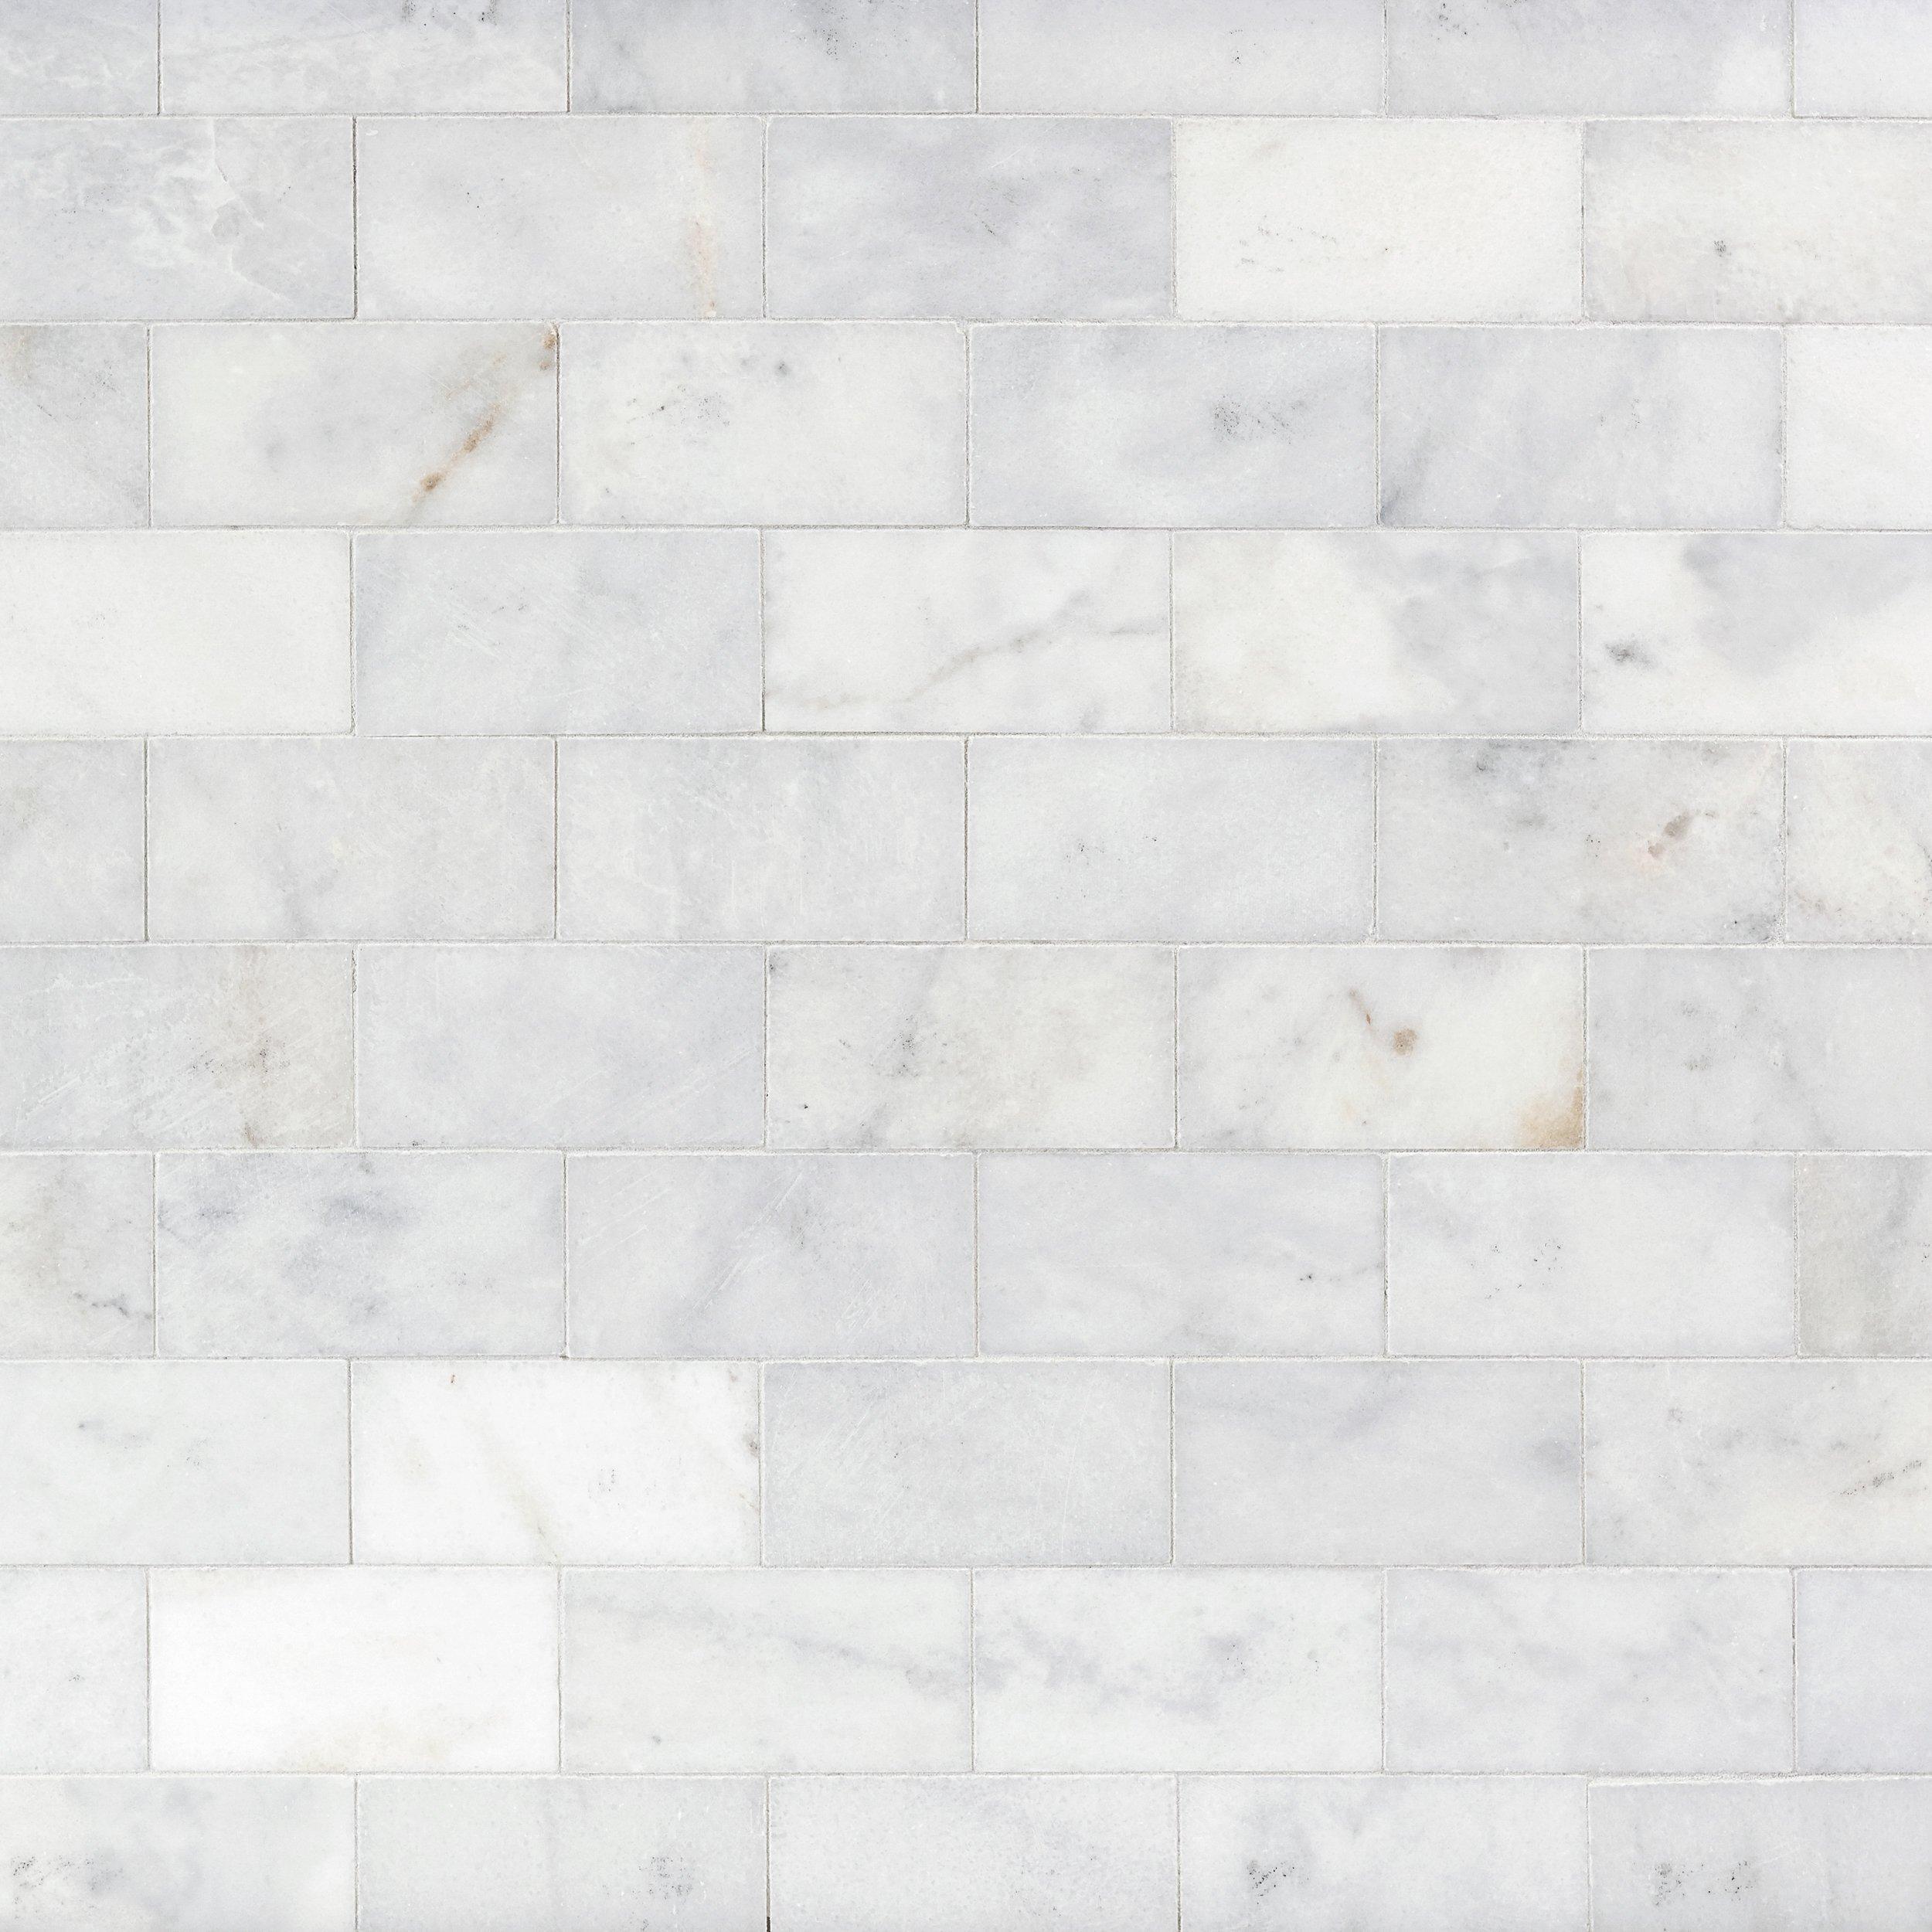 Ocean Honed Marble Tile 3 x 6 100246016 Floor and Decor